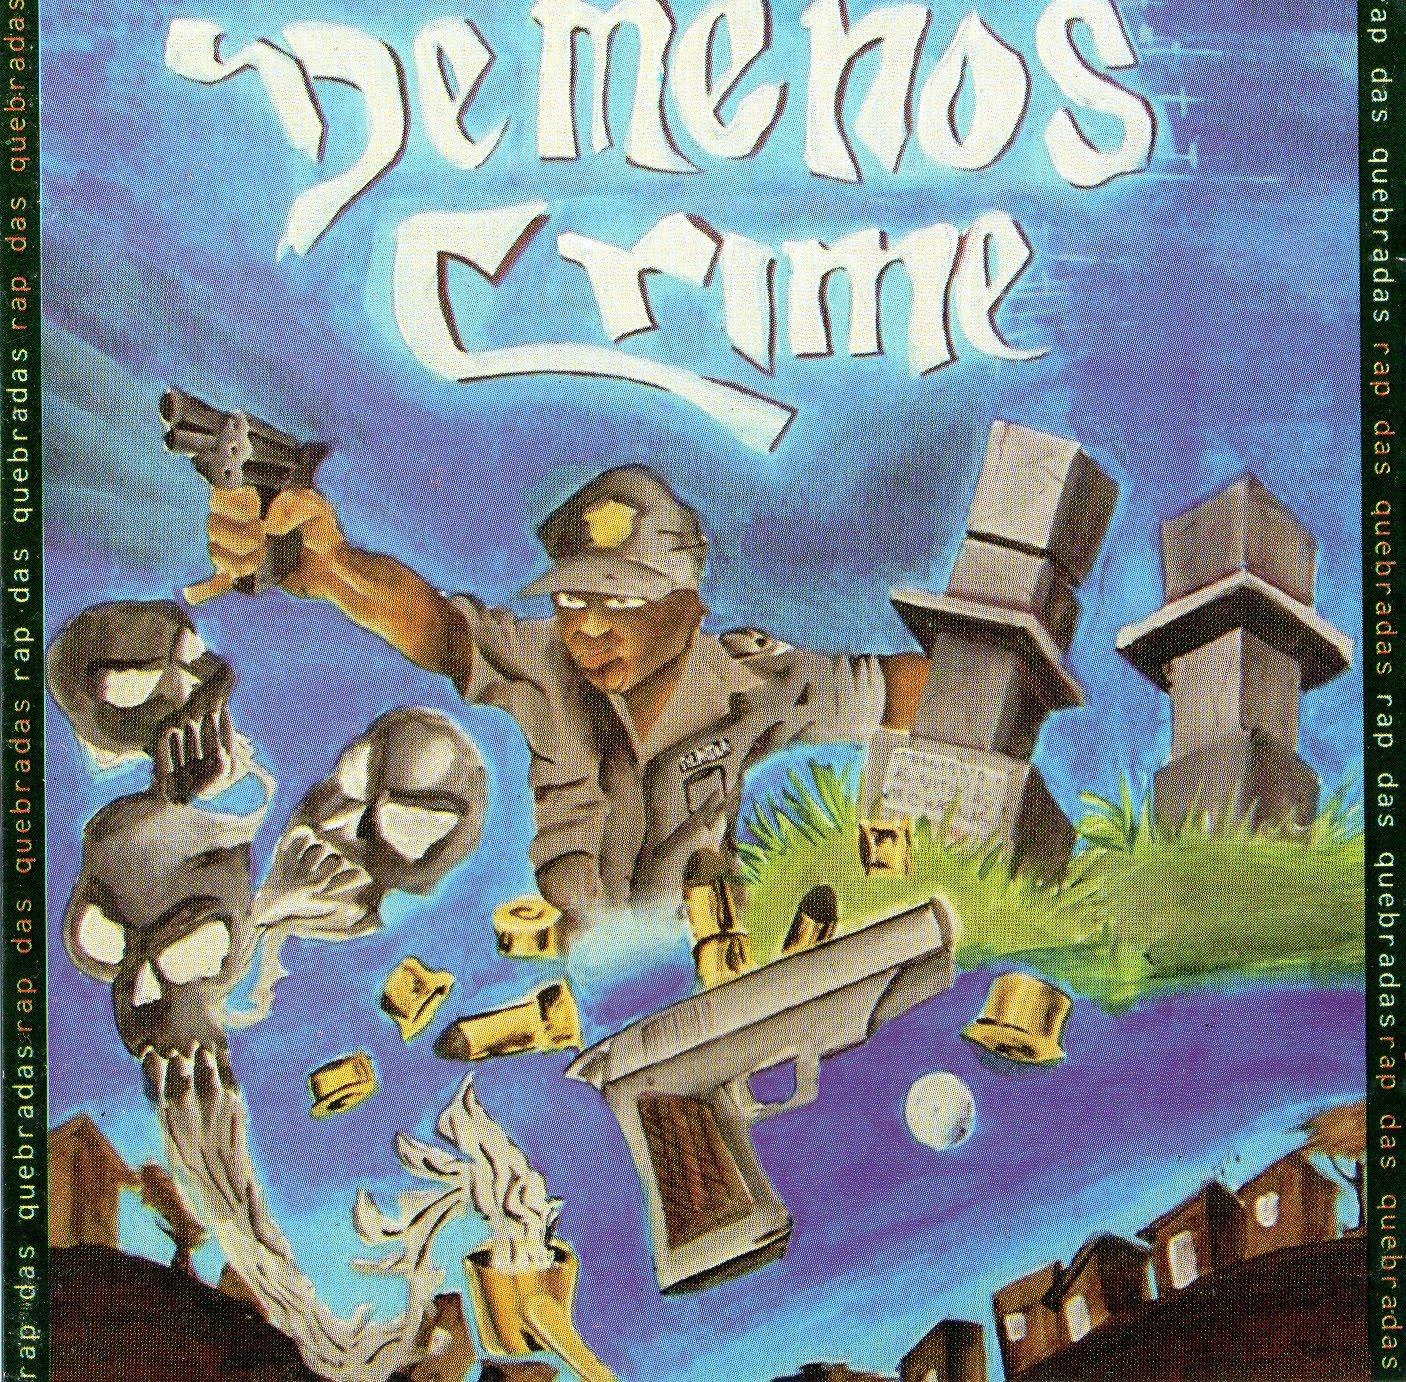 DEMENOS CRIME